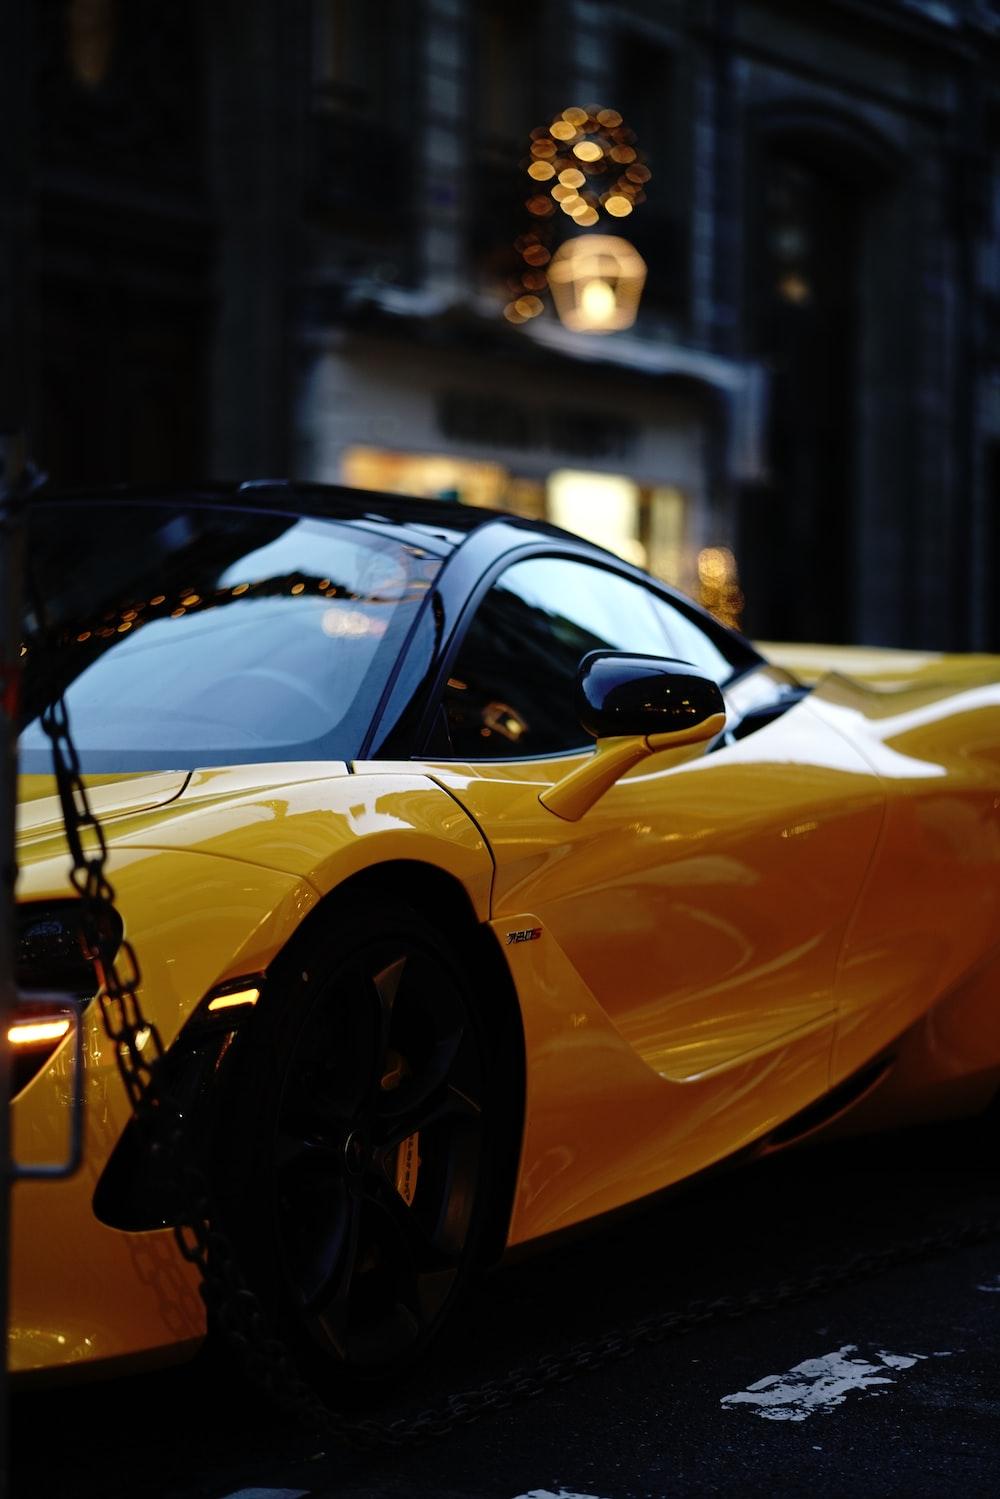 yellow ferrari 458 italia parked on street during daytime